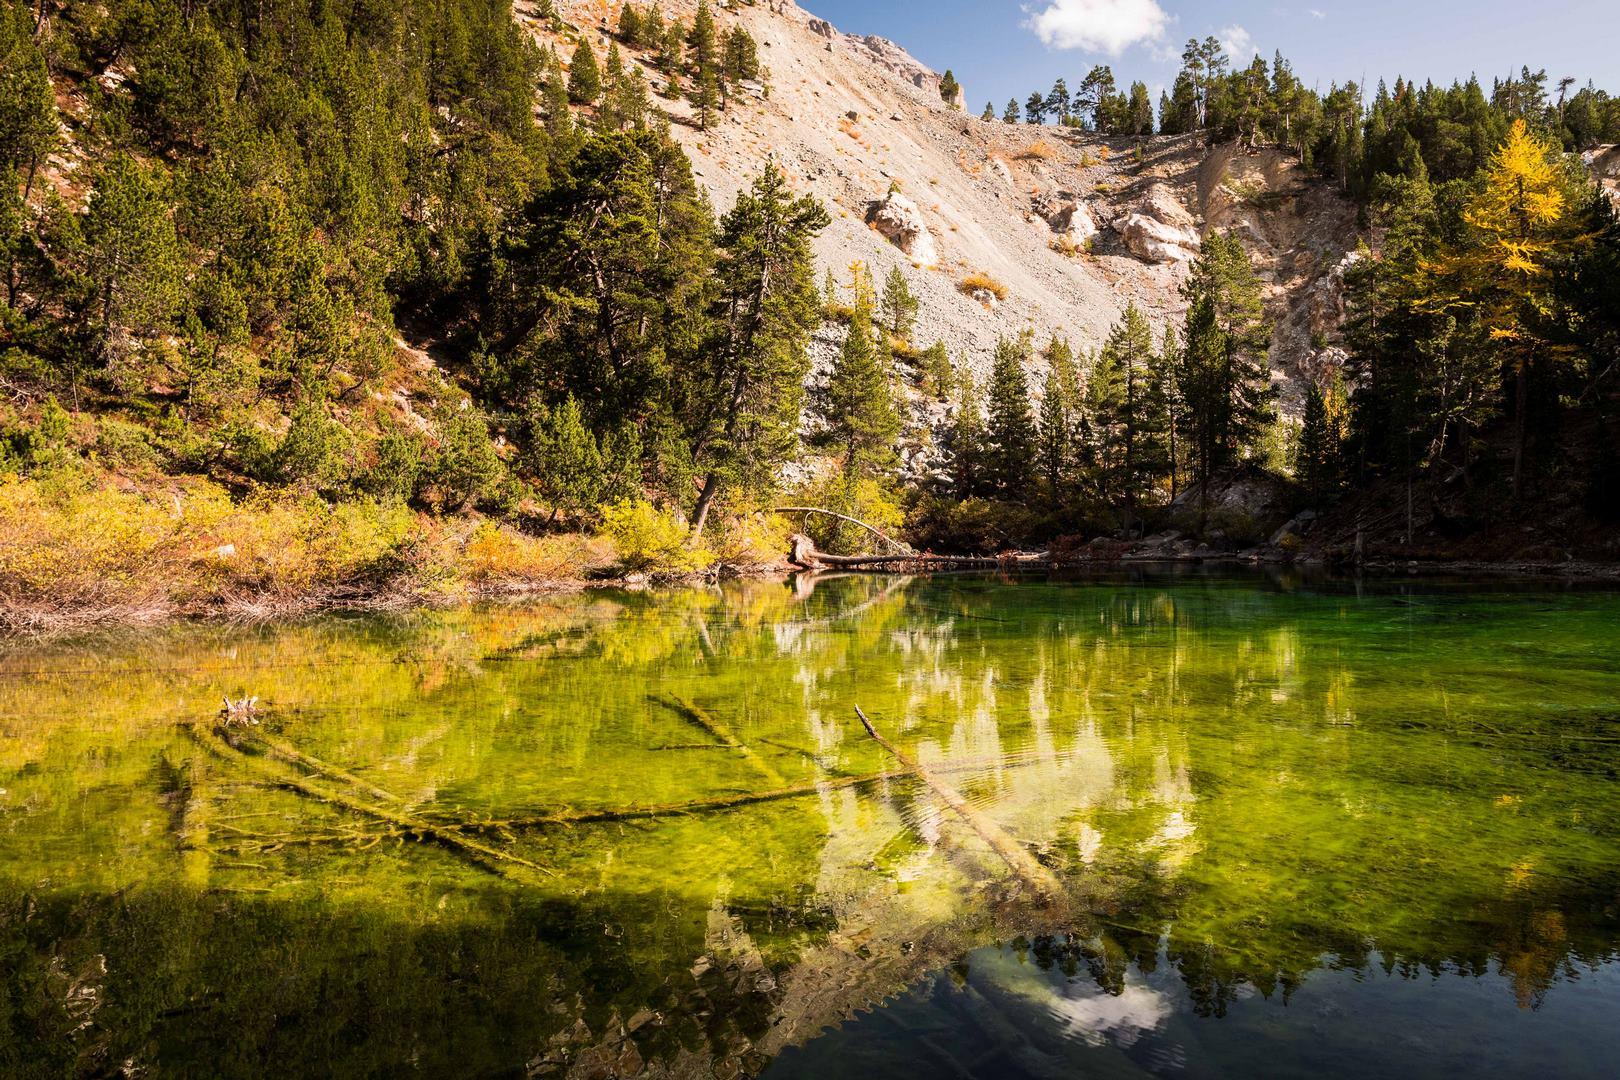 Lac vert vallée étroite